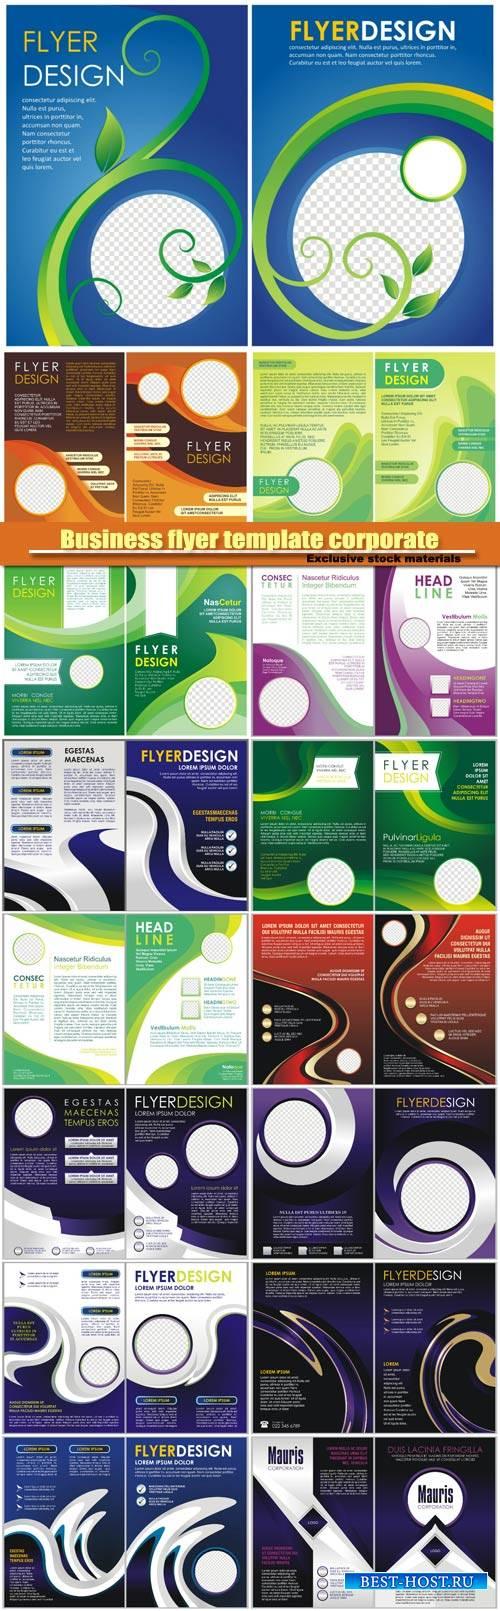 Business flyer template corporate design